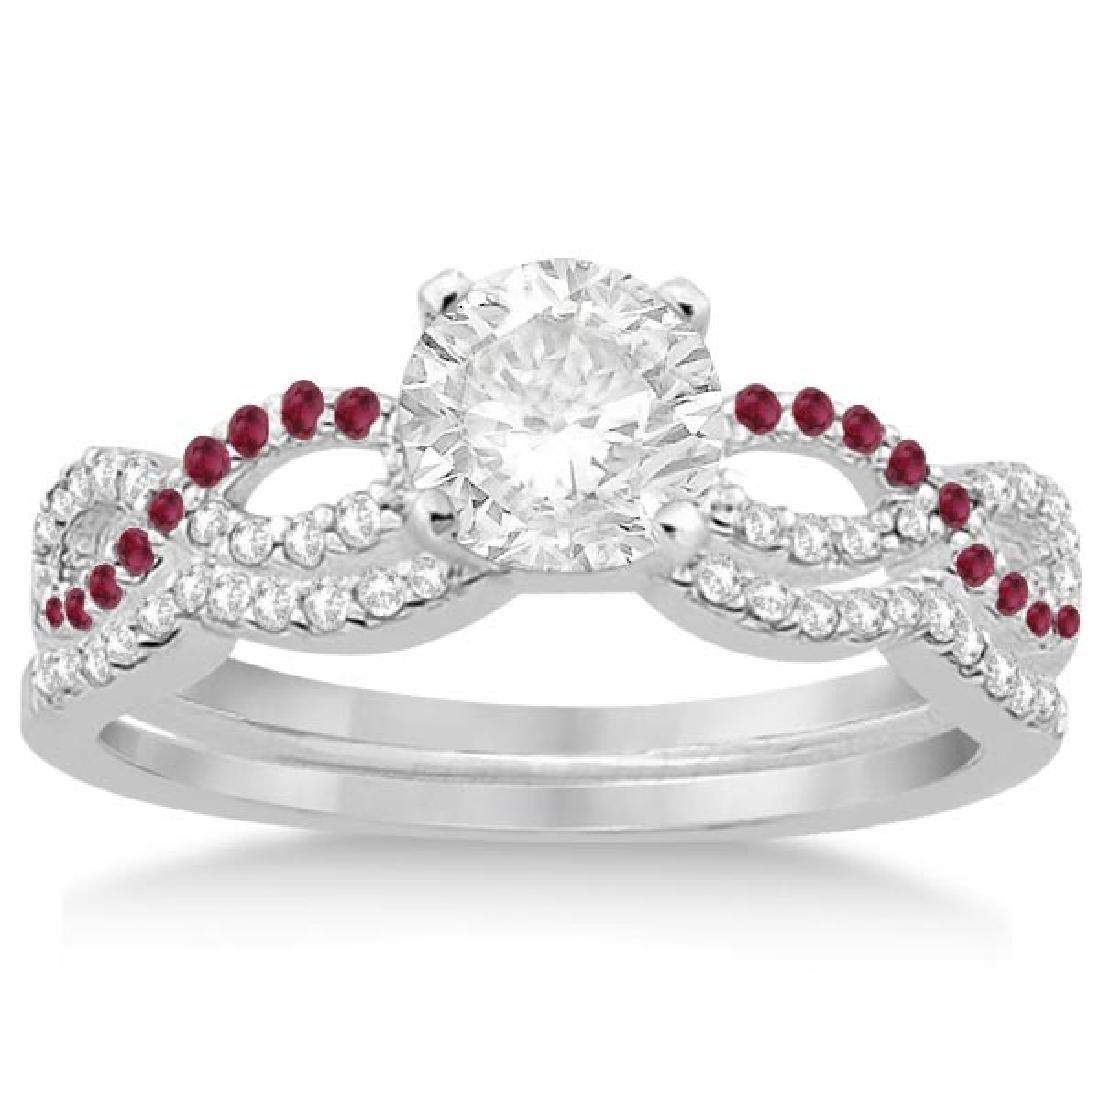 Infinity Diamond and Ruby Engagement Ring Set 14K White